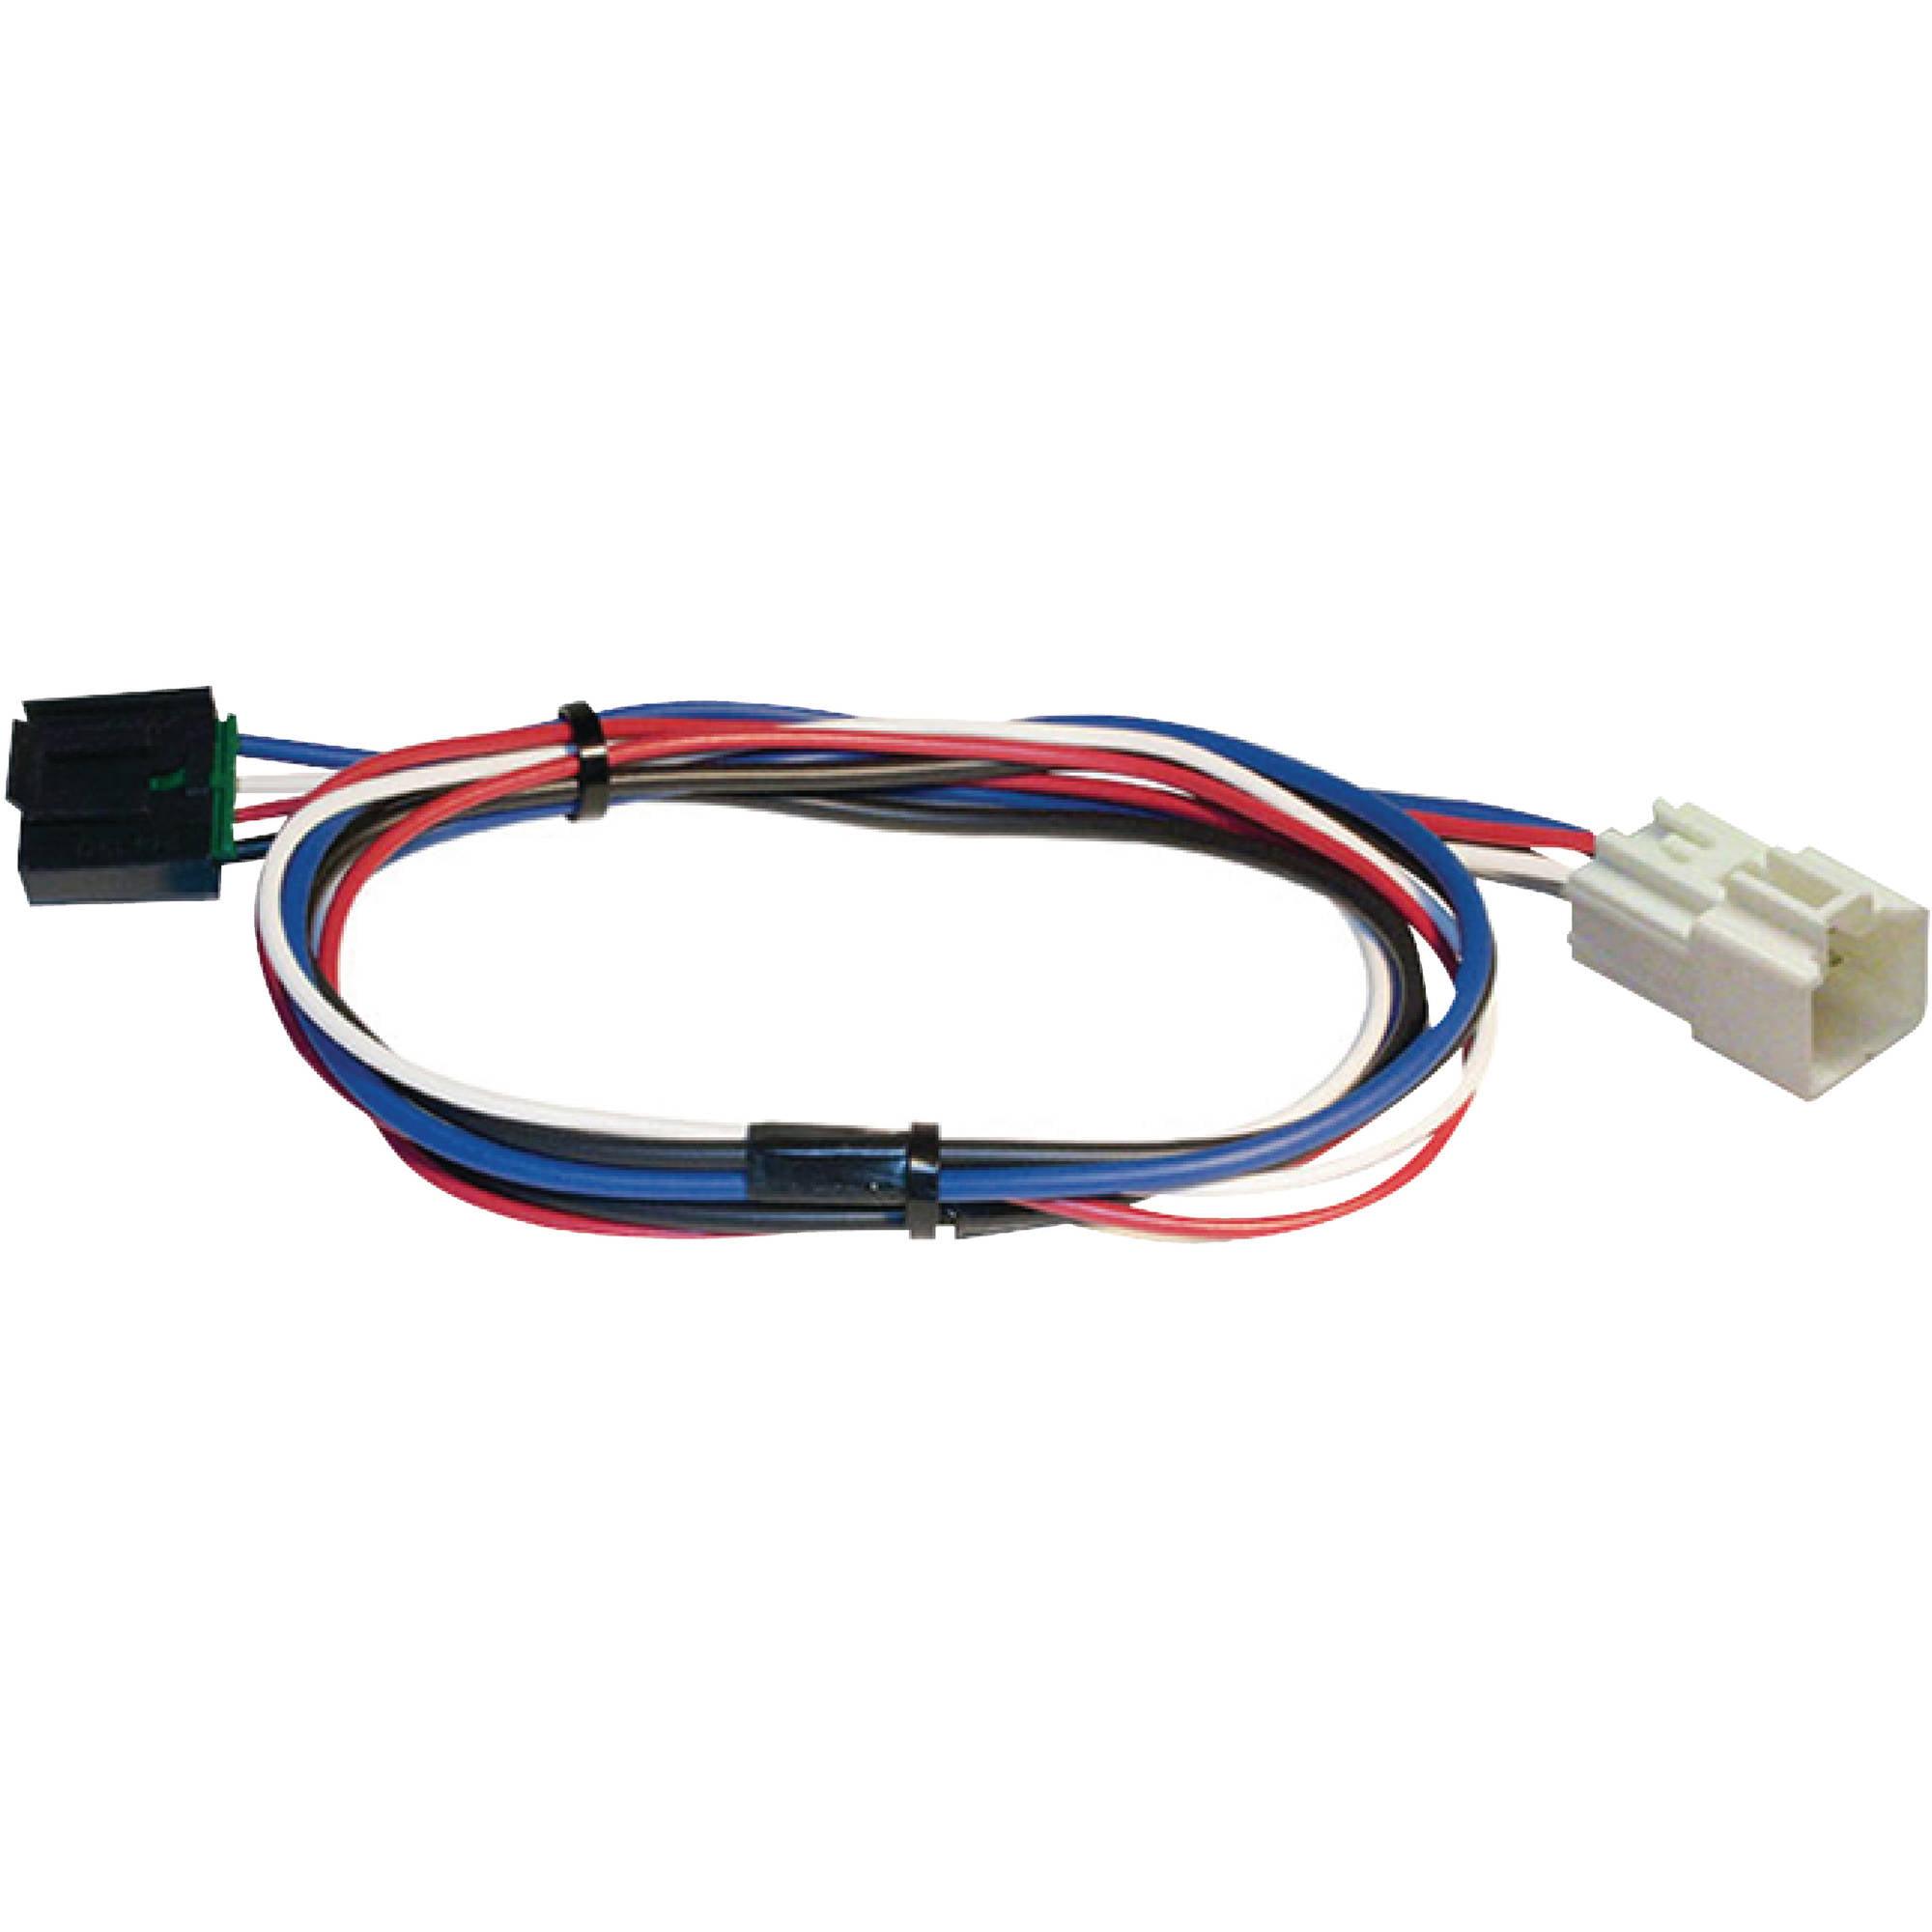 Seachoice Dual Plug Brake Control Wiring Harness